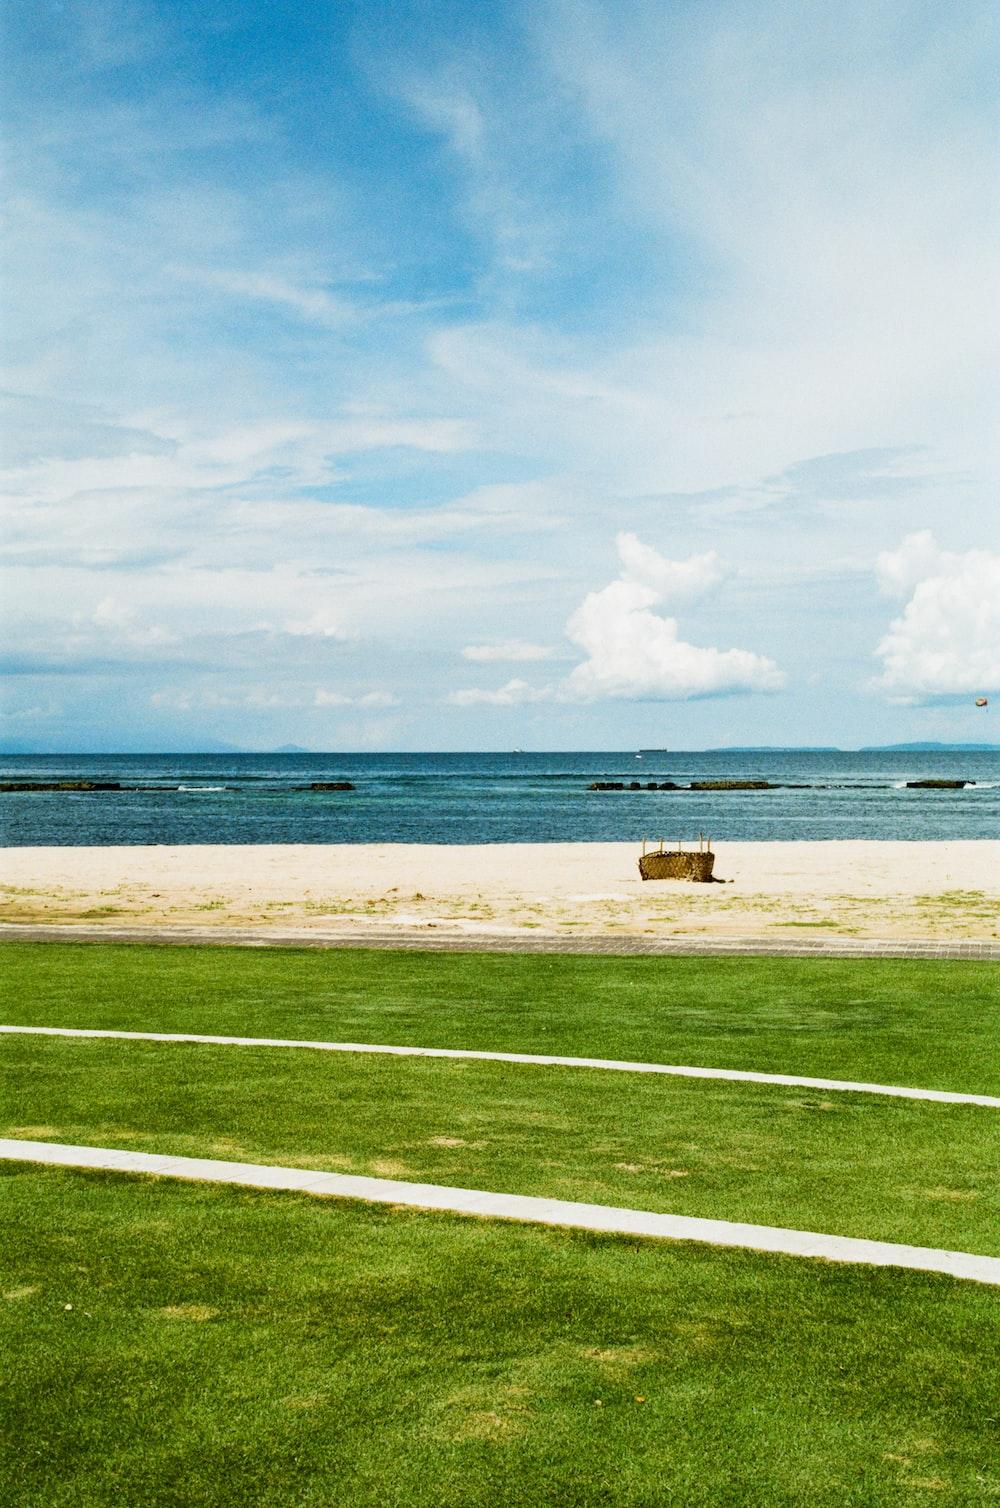 grass field near seashore